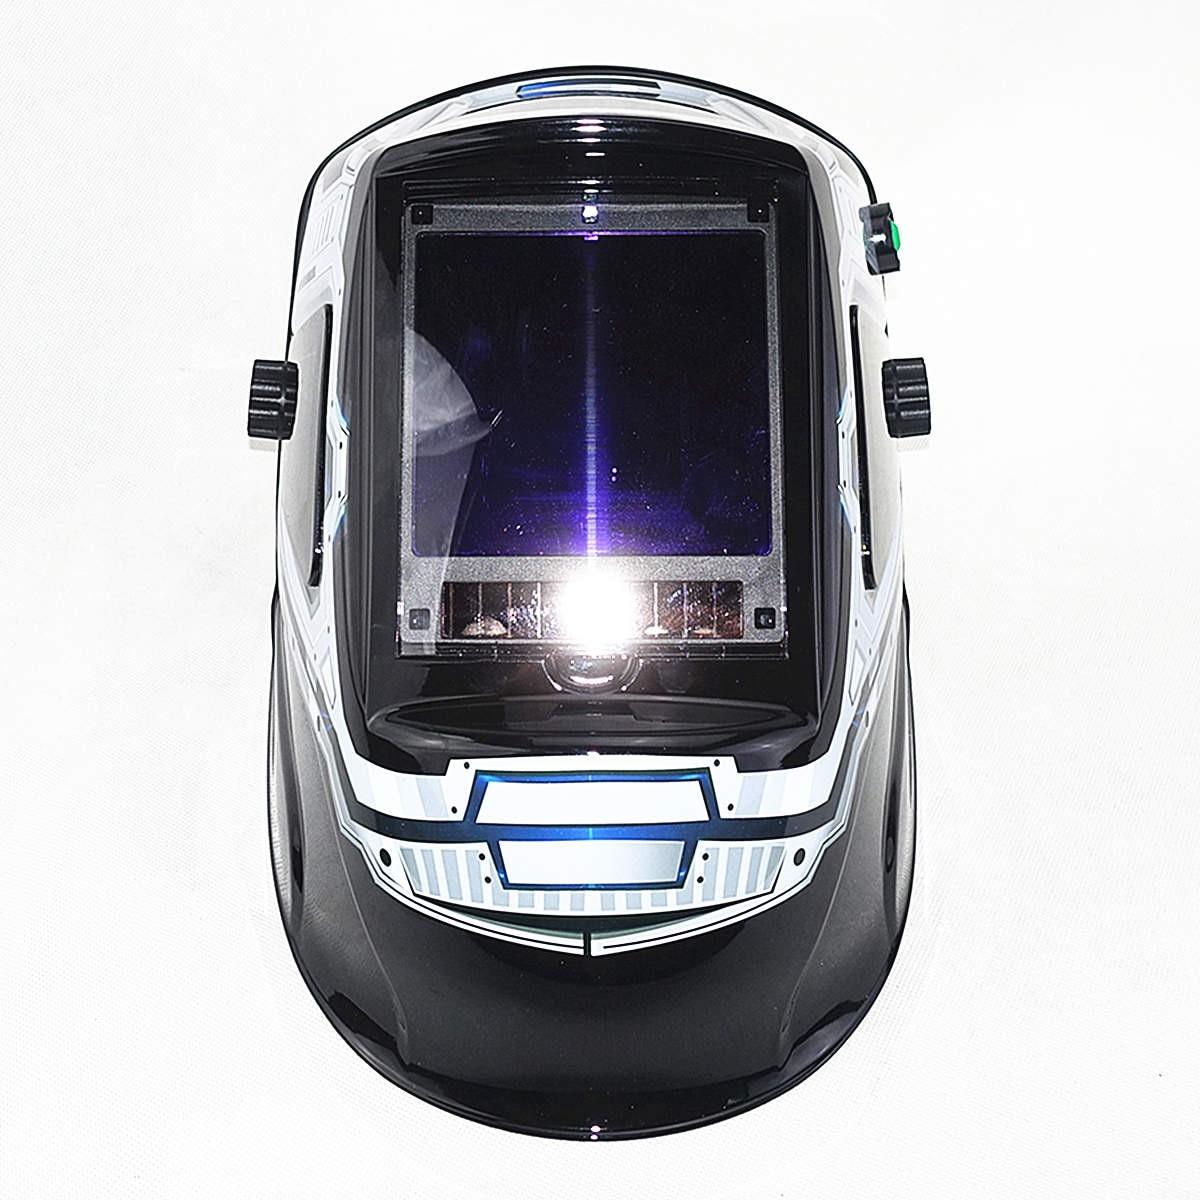 1111 13 DIN EN379 100x93mm 3 66inch Helmet Mask  Optical Auto Darkening Windows View 5 3 94x3  Sensors 4 Welding Size Welding